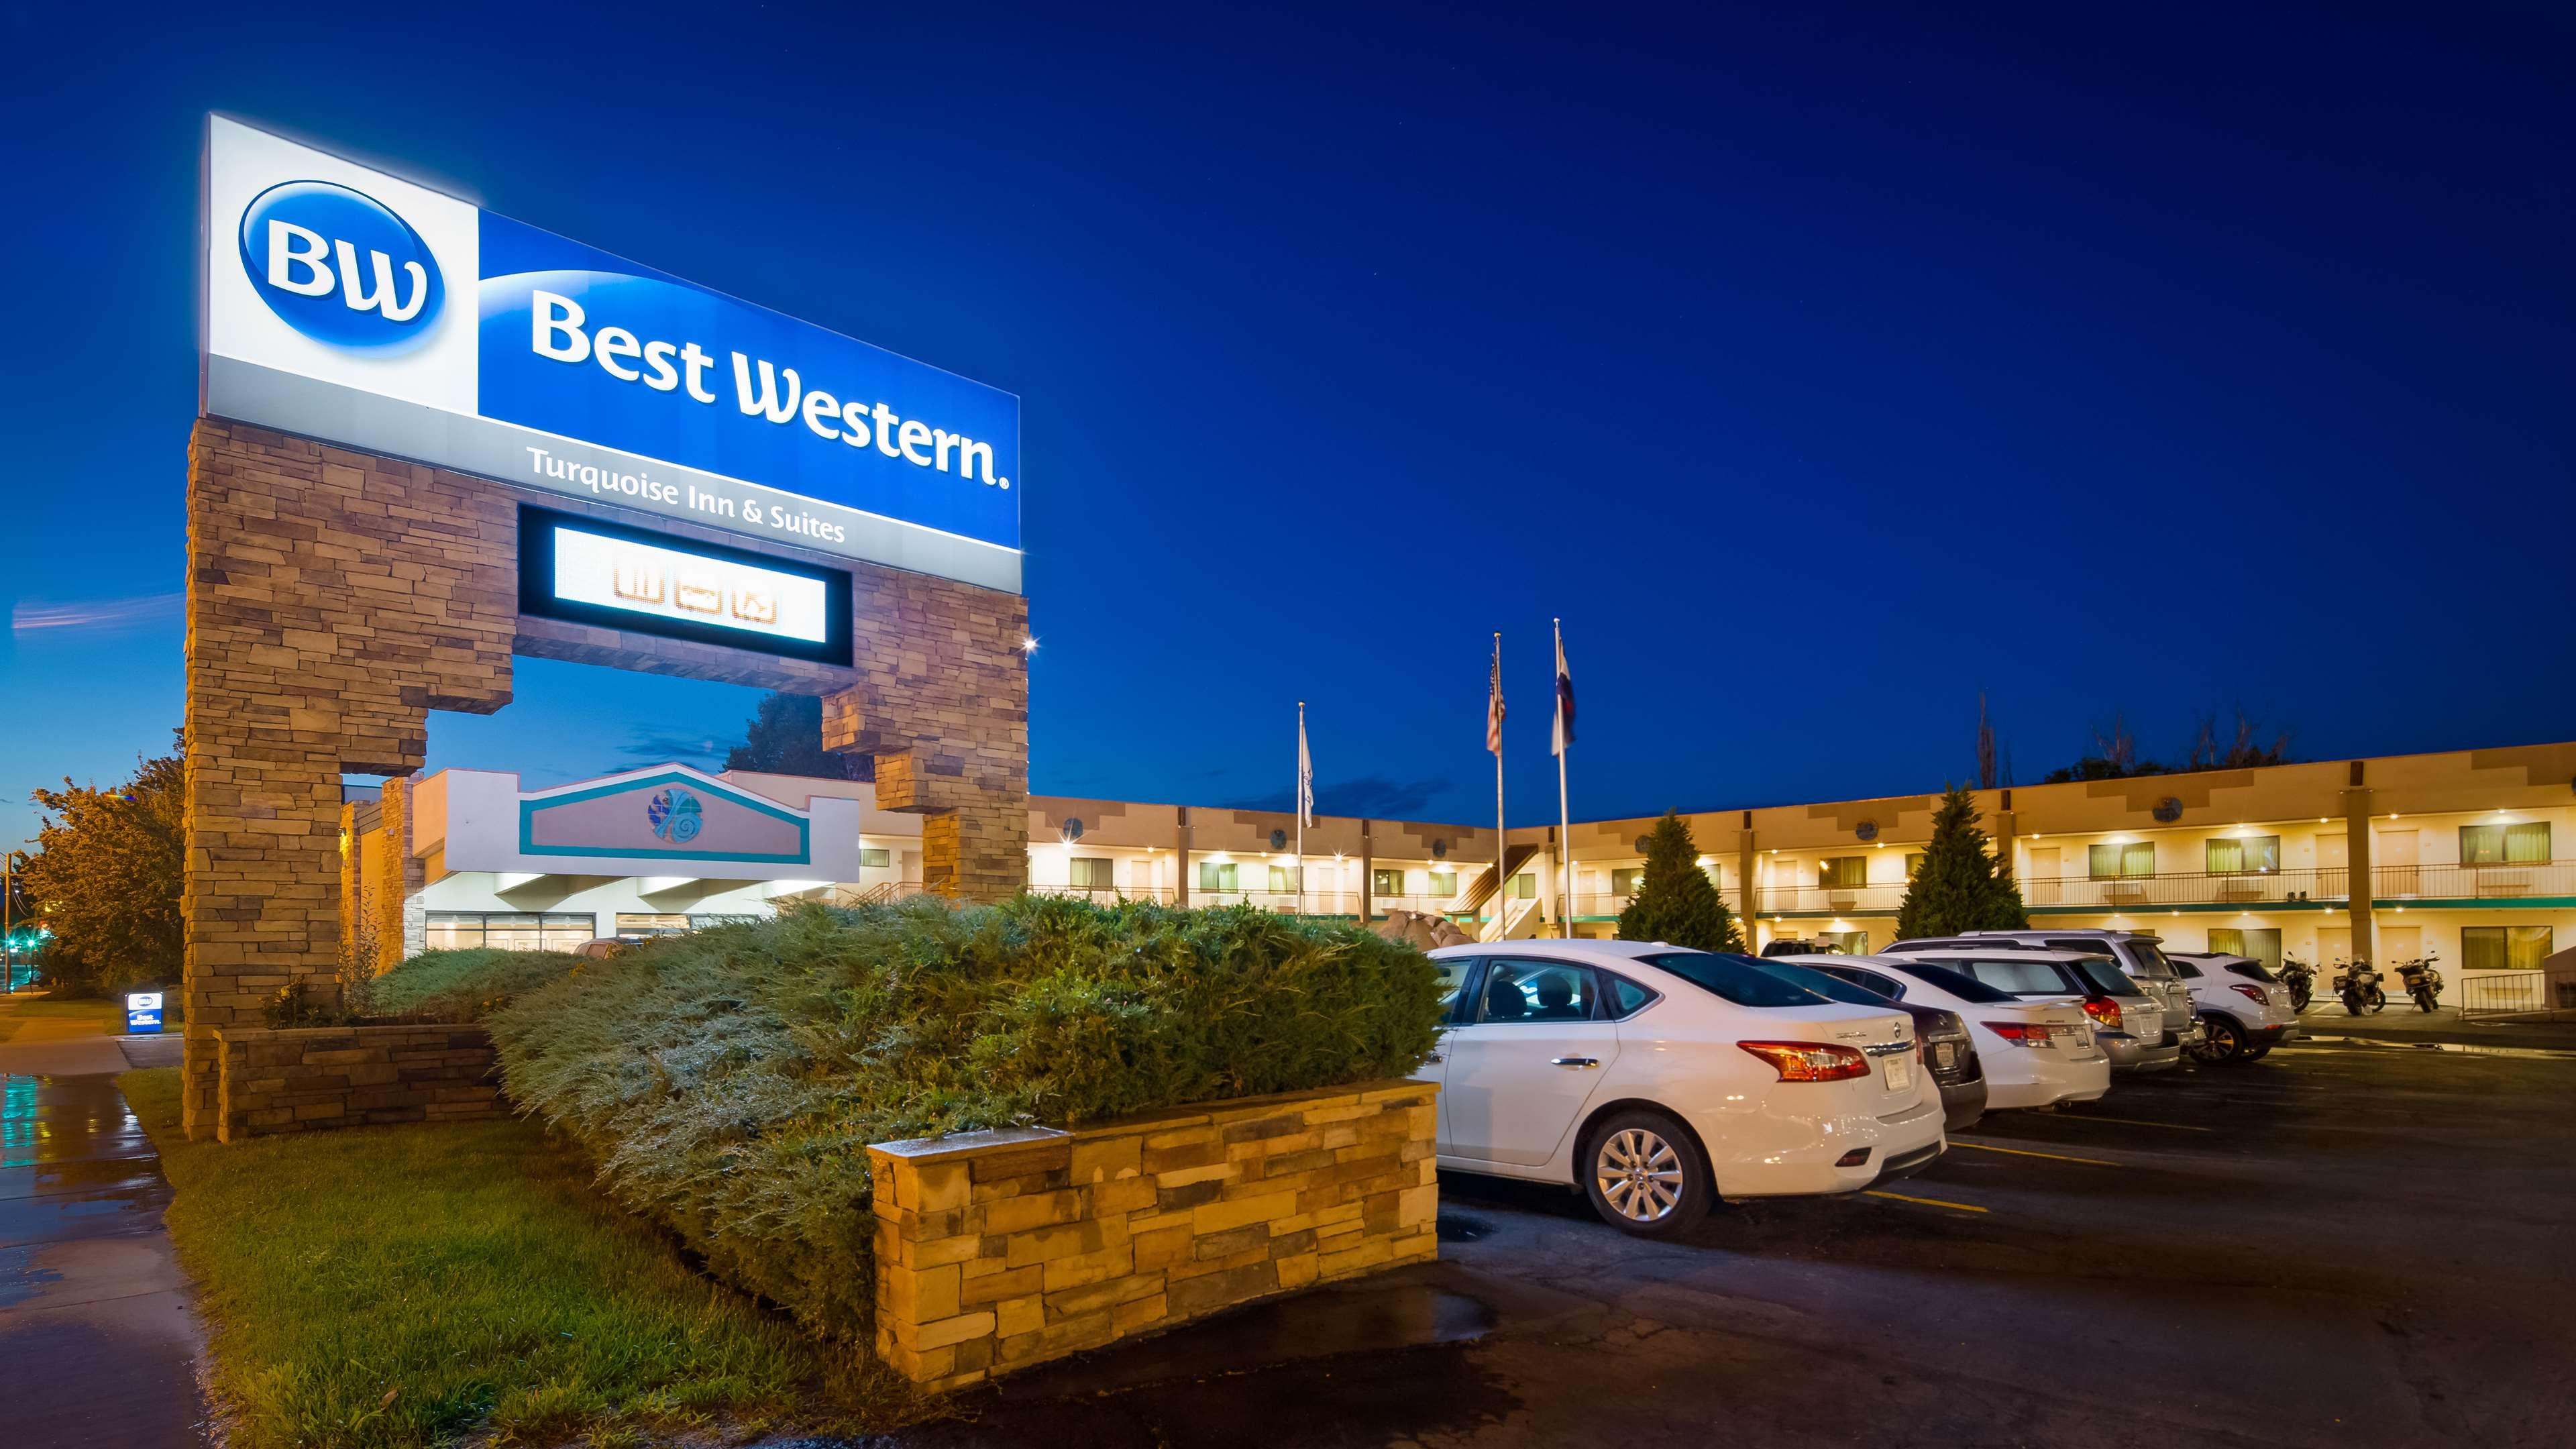 Best Western Turquoise Inn & Suites image 1